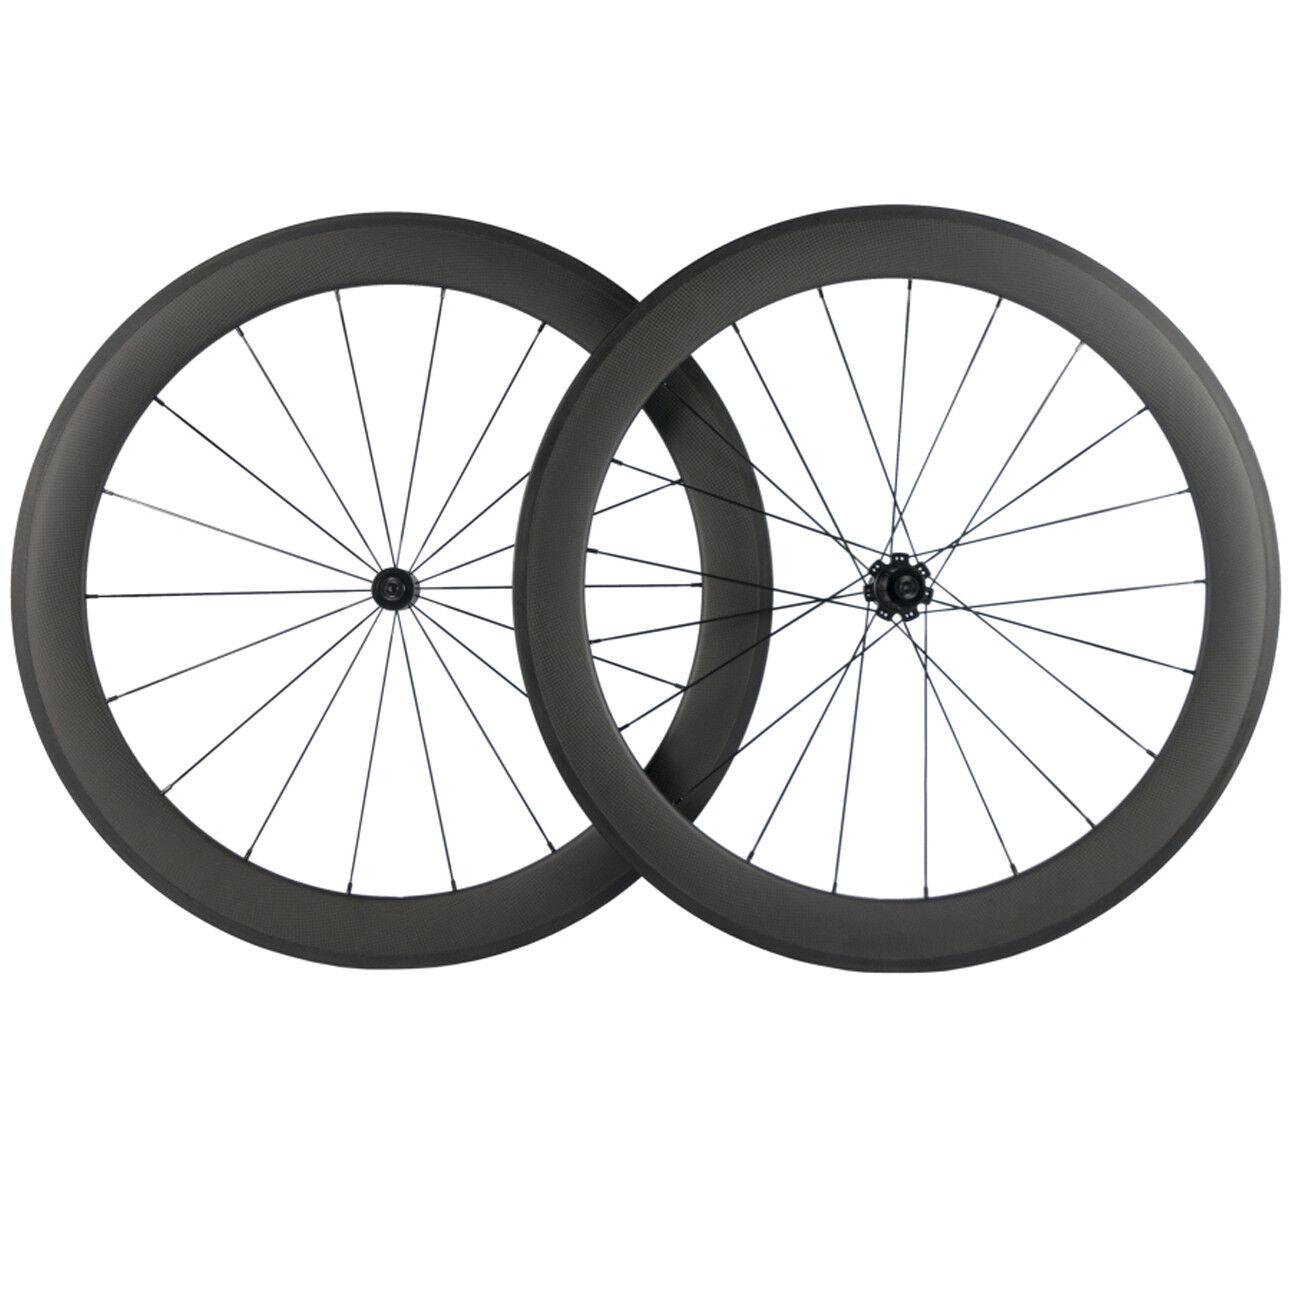 60MM Clincher Carbon Wheelset Road Bike R7 Hub R7 Ceramic Hub 23MM 25MM Width